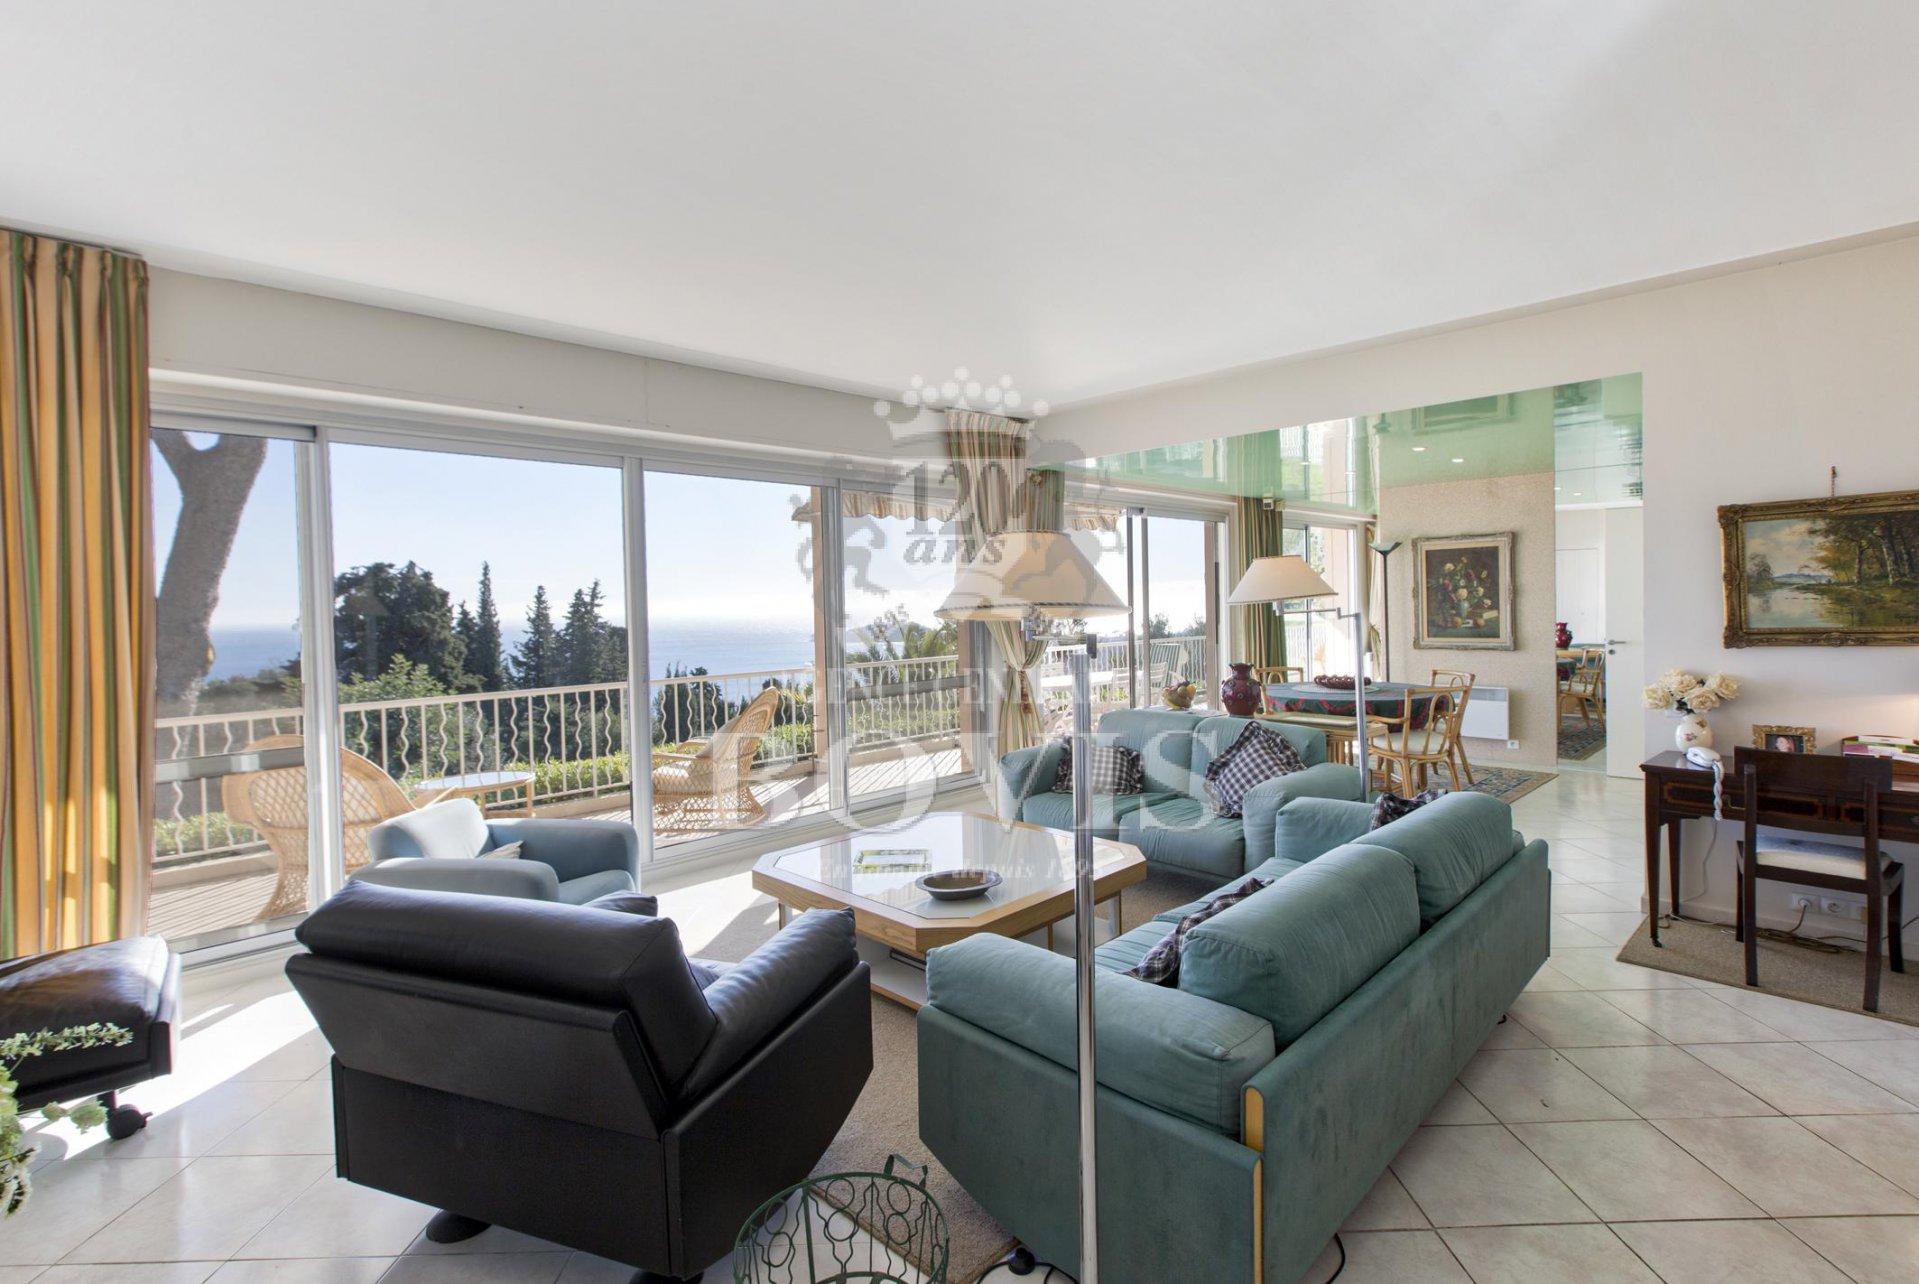 vente appartement 3 pieces villefranche sur mer. Black Bedroom Furniture Sets. Home Design Ideas